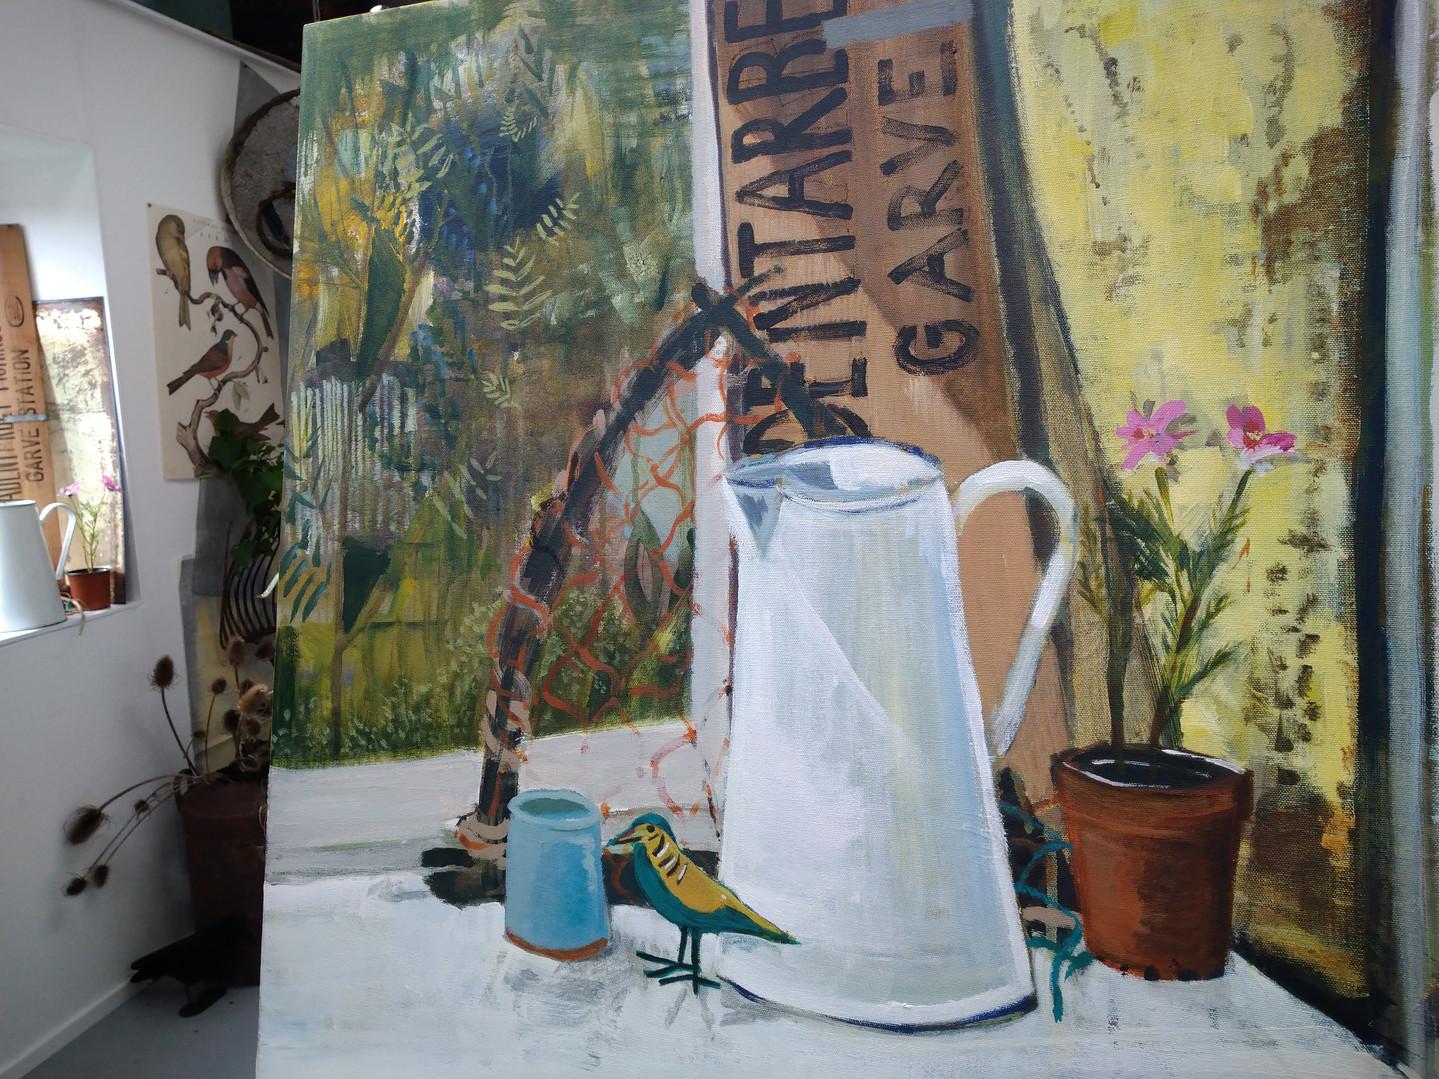 Student work - acrylic painting